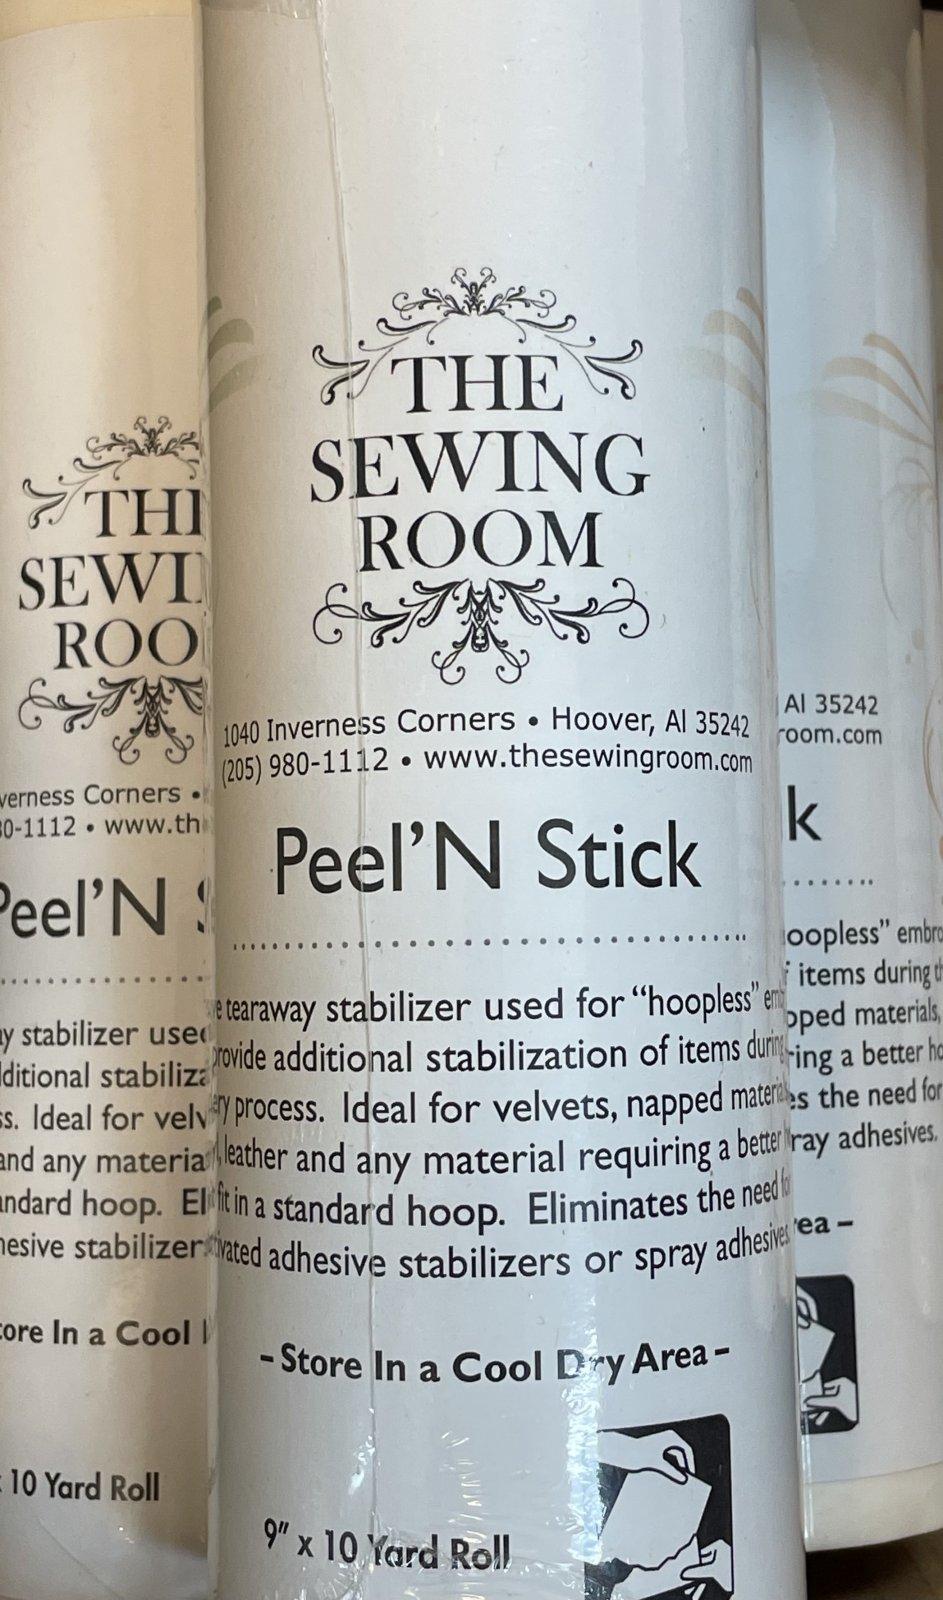 Peel 'N Stick